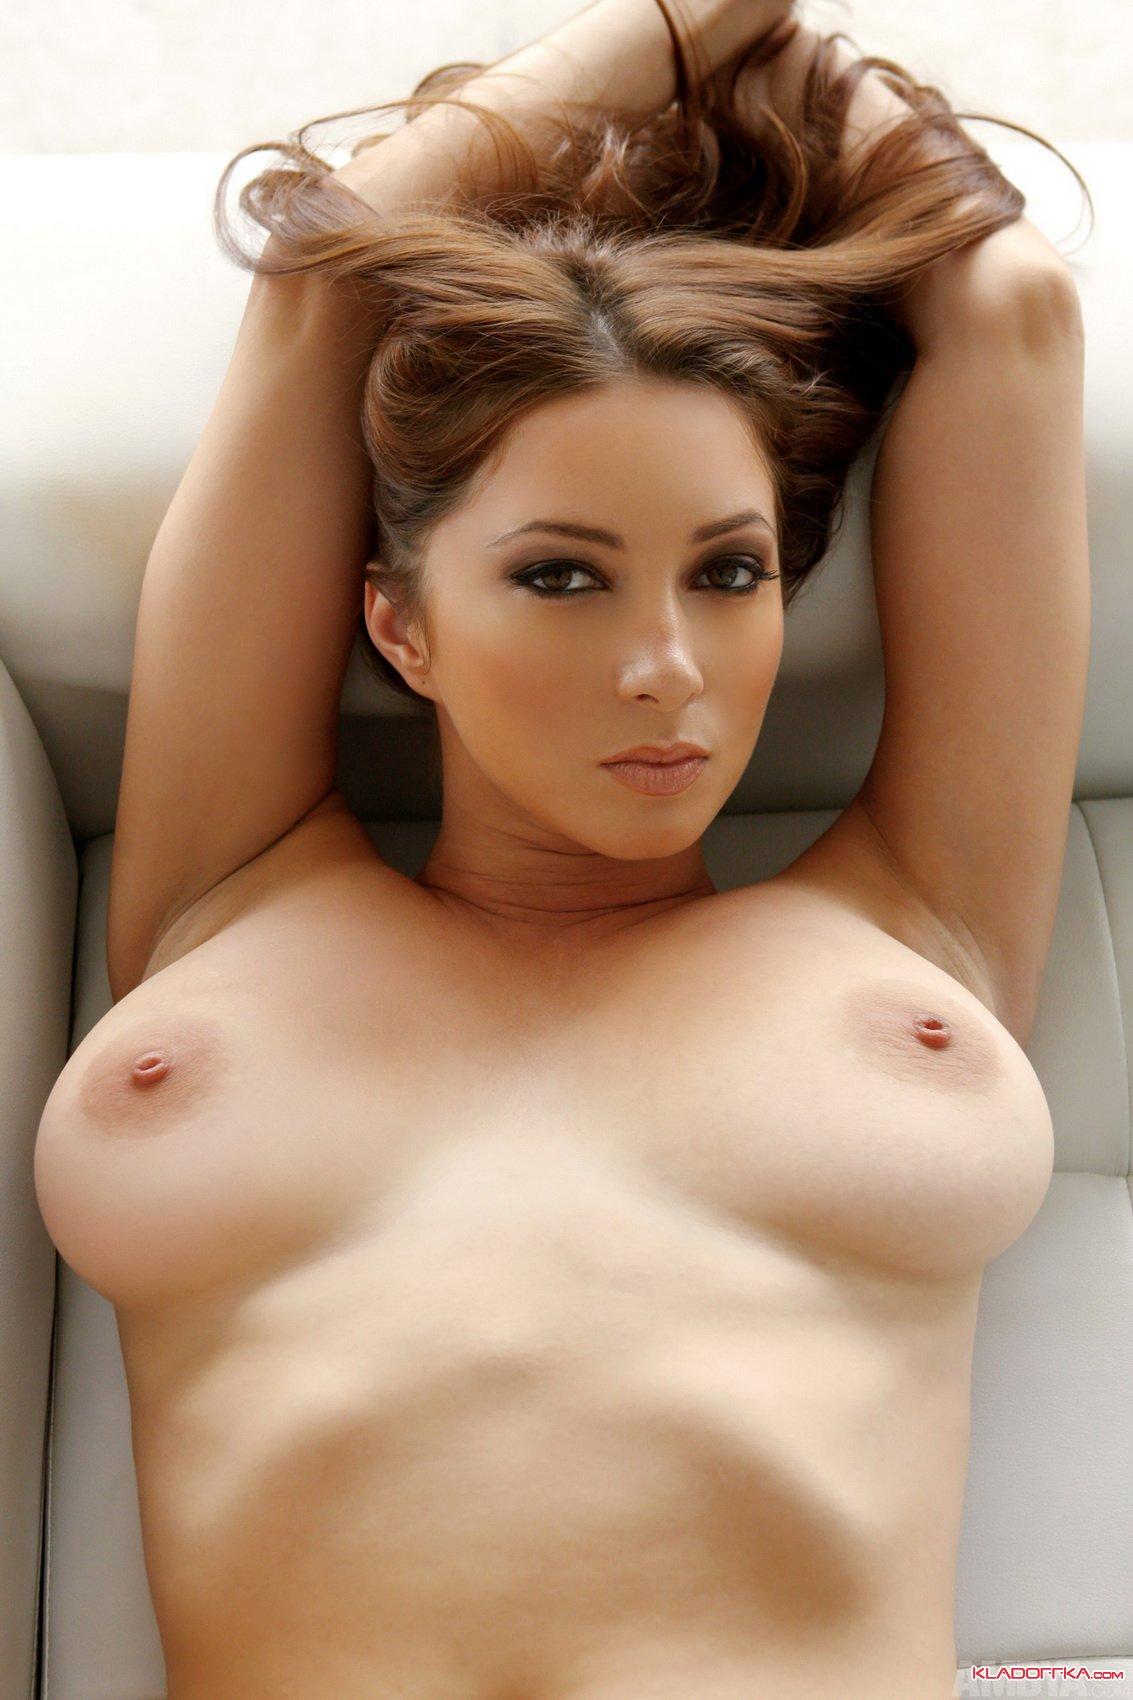 Julie white nude, real live lesbian sex